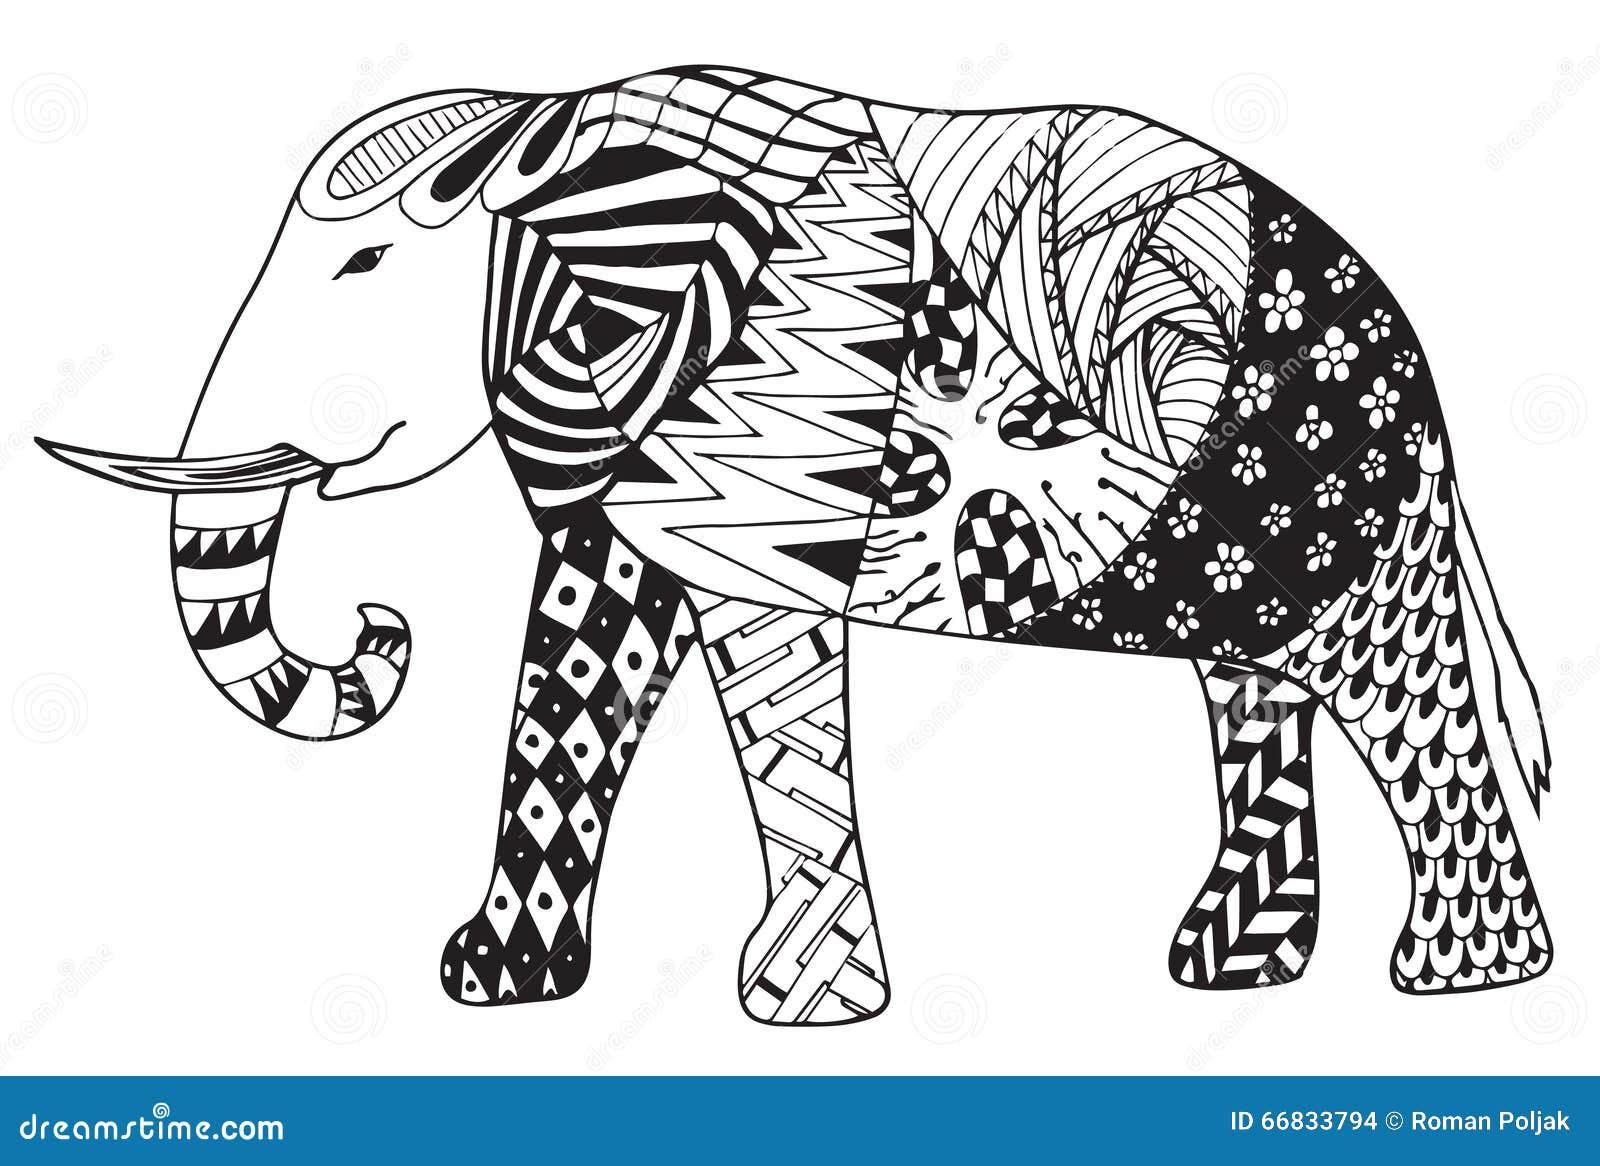 Elephant Zentangle Stylized Vector Illustration Freehand